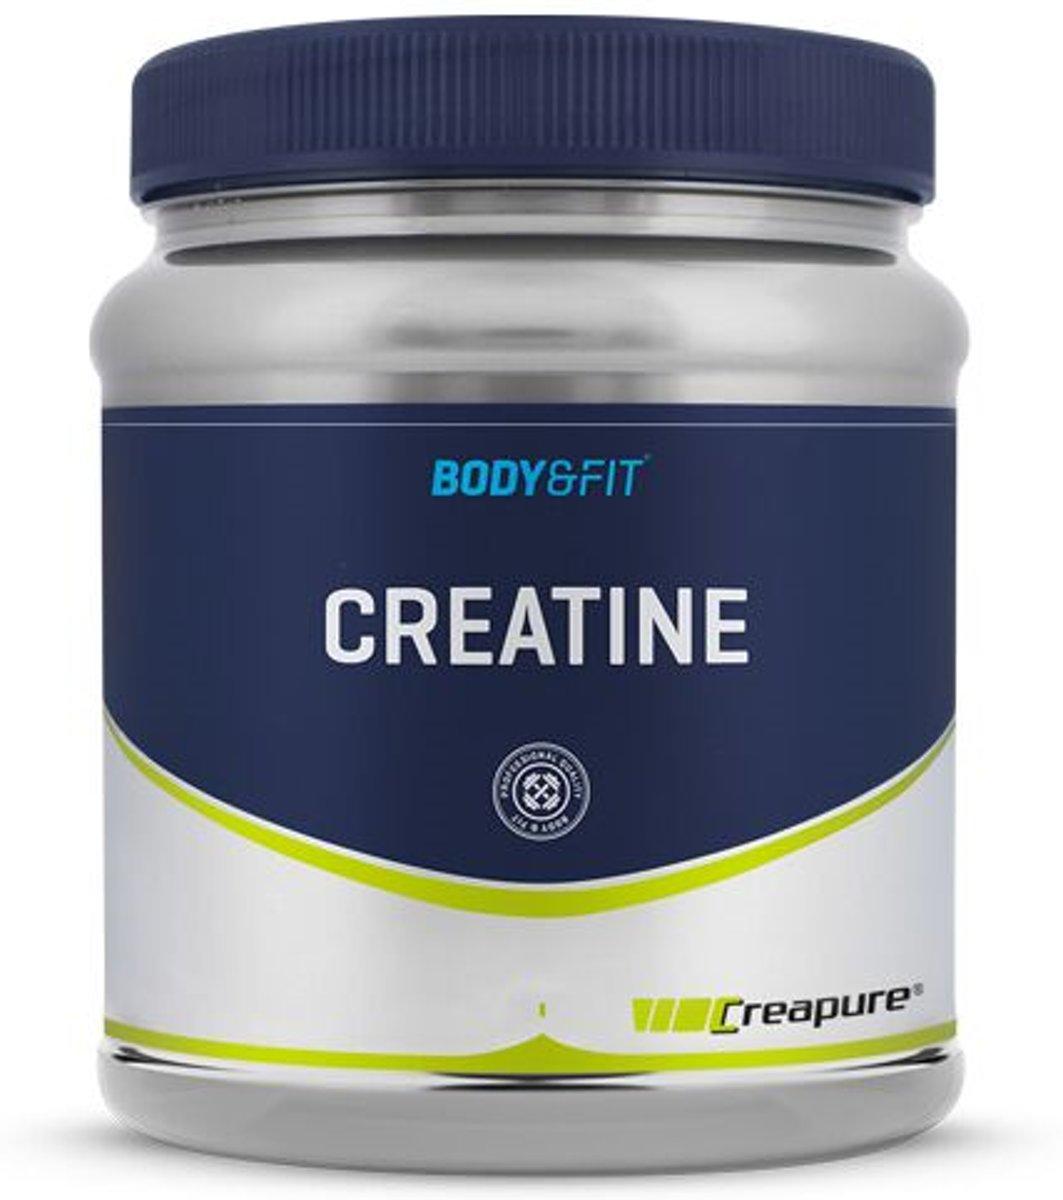 Body & Fit Creatine - CreaPure® (best creatine worldwide) - 500 gram kopen